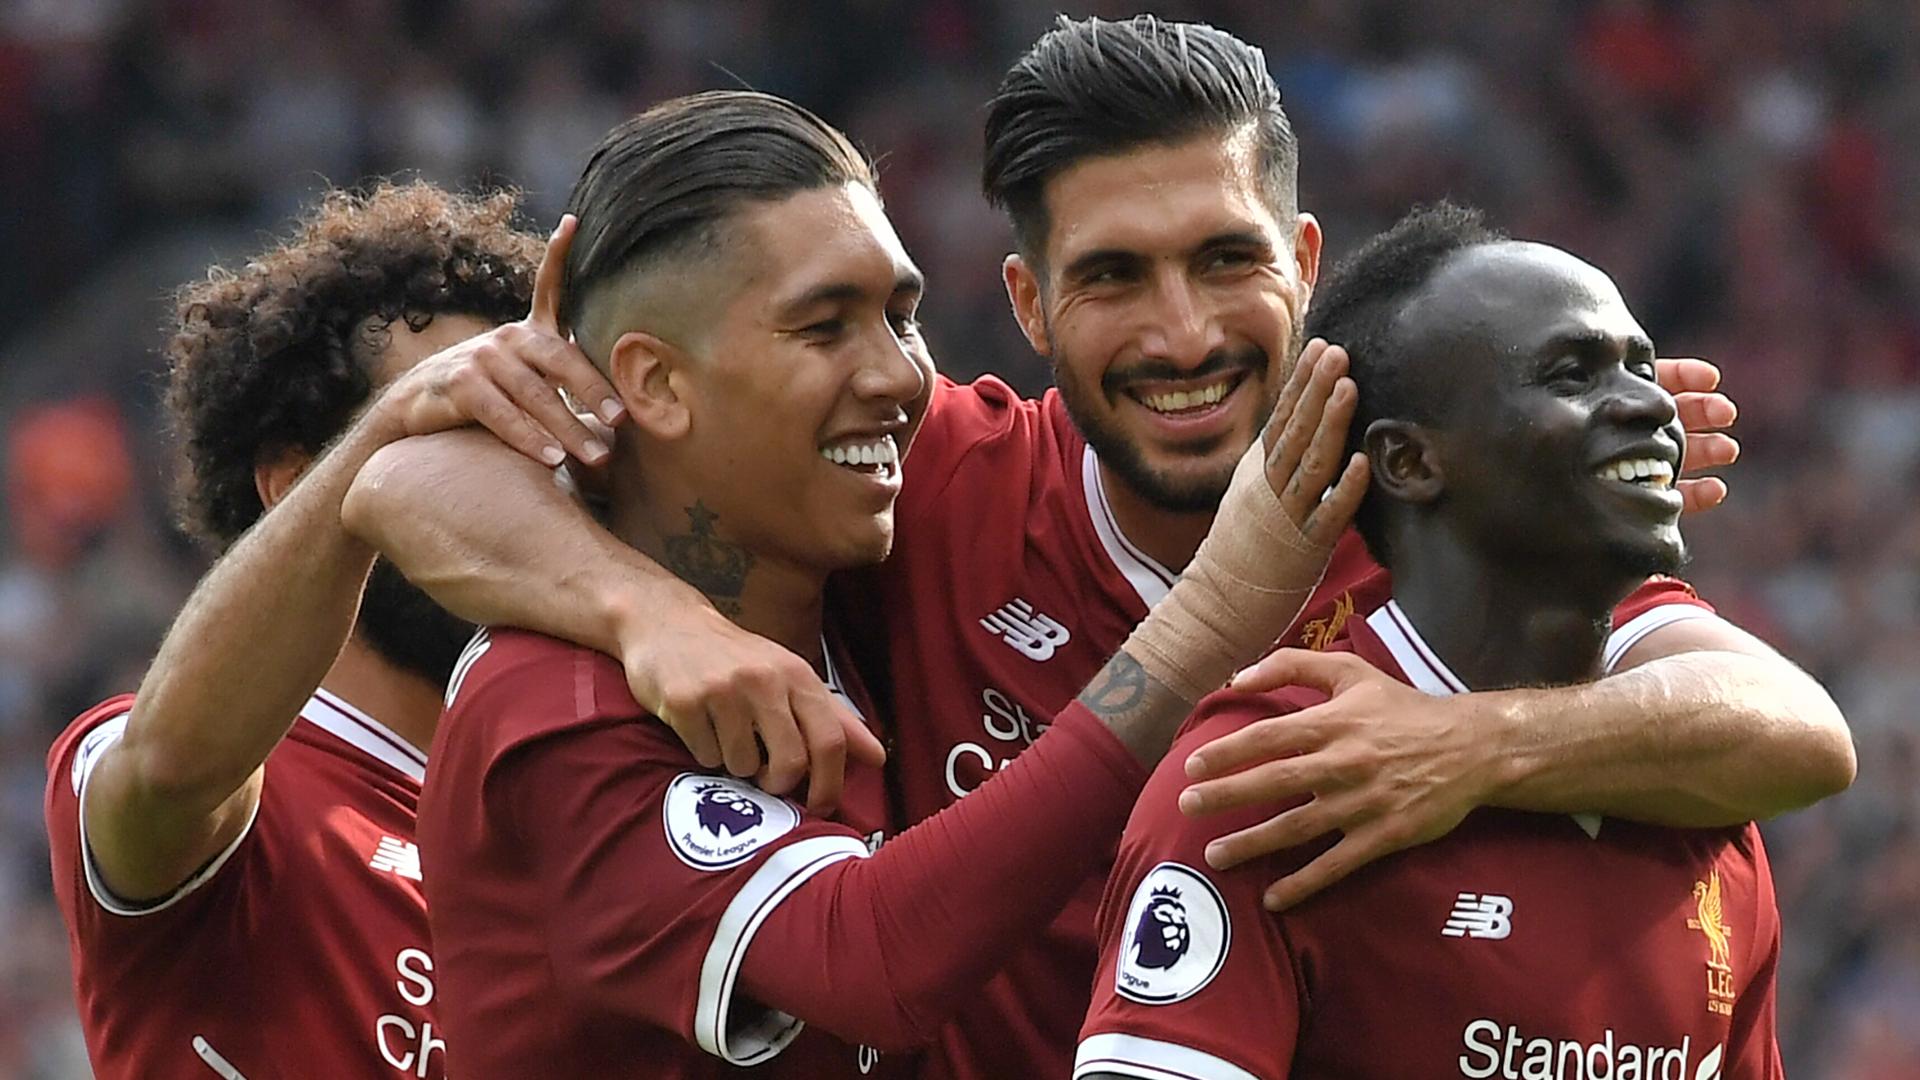 SoccerNation Supporter Special: A Jubilant Morning At